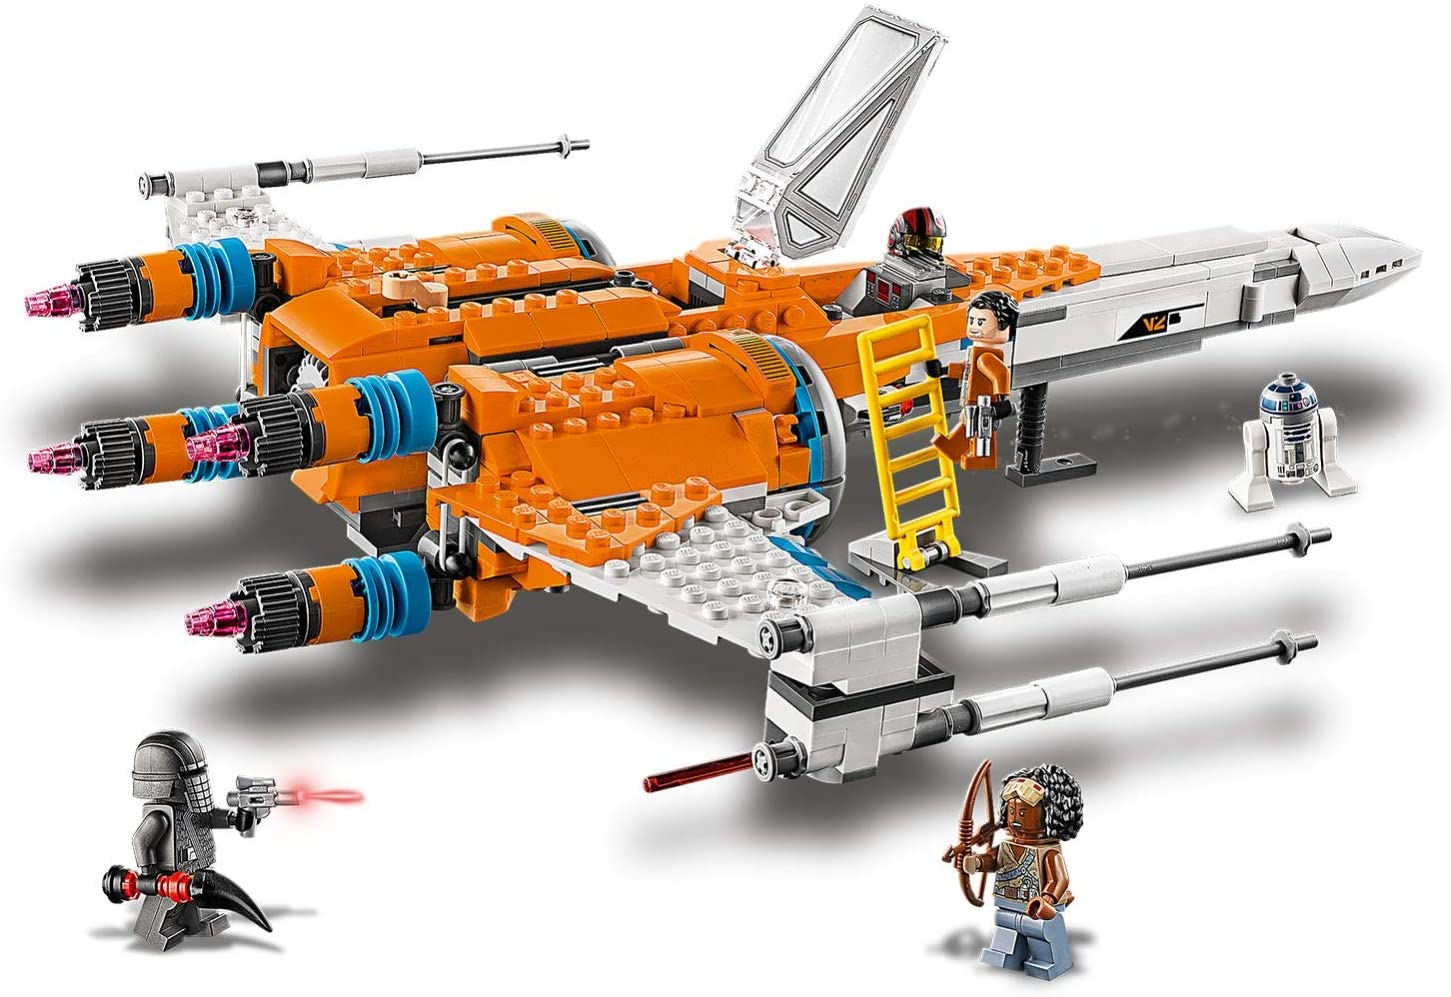 LEGO Star Wars - Le chasseur X-wing de Poe Dameron